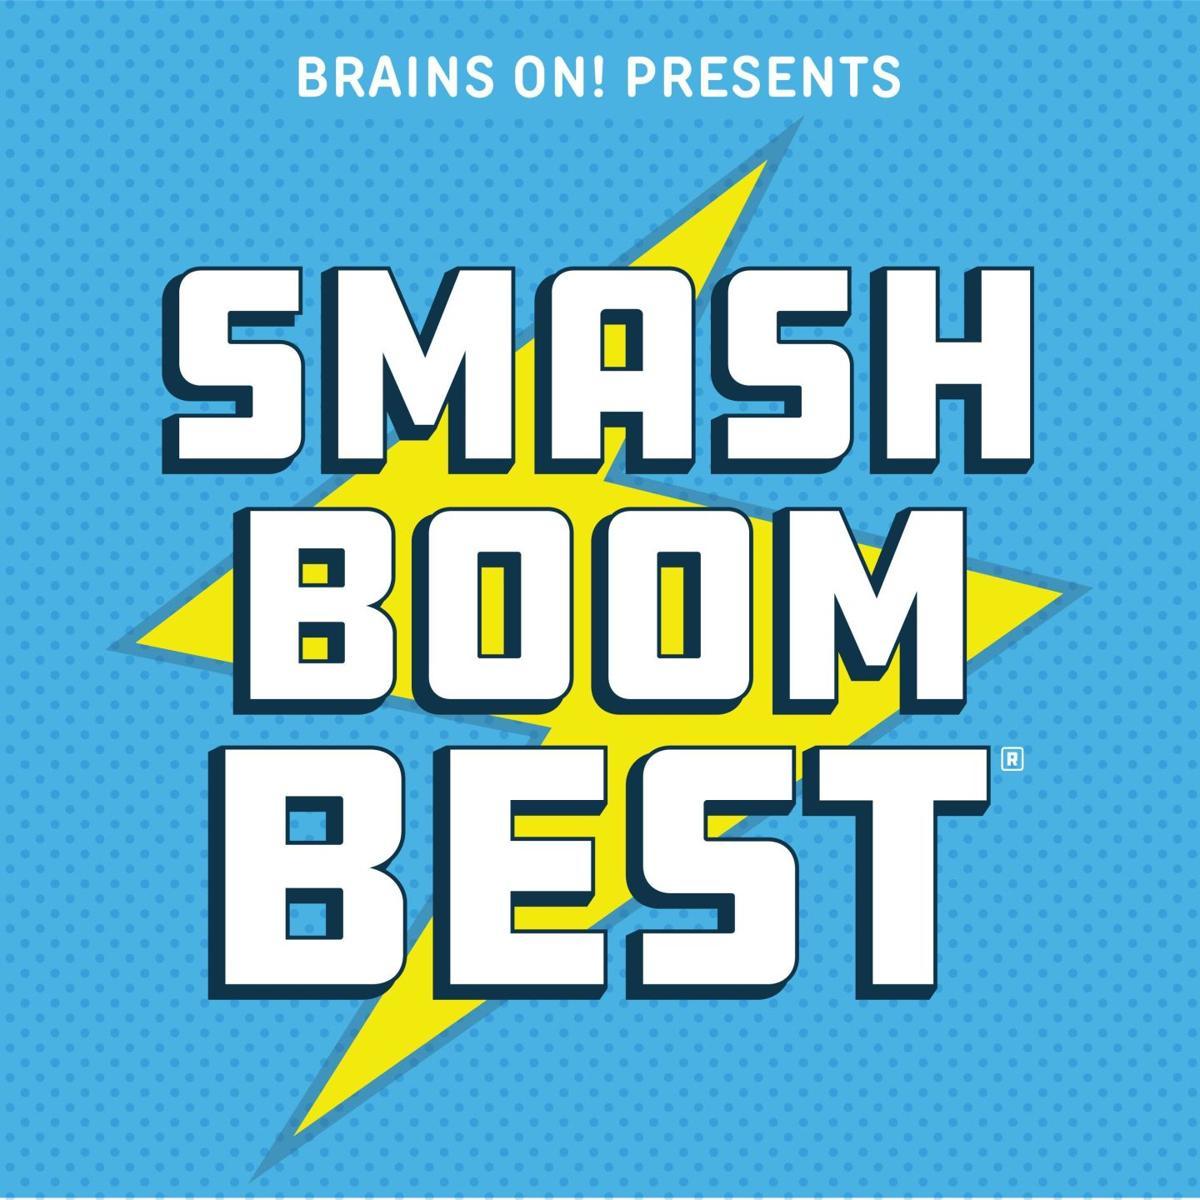 Smash, Boom, Best